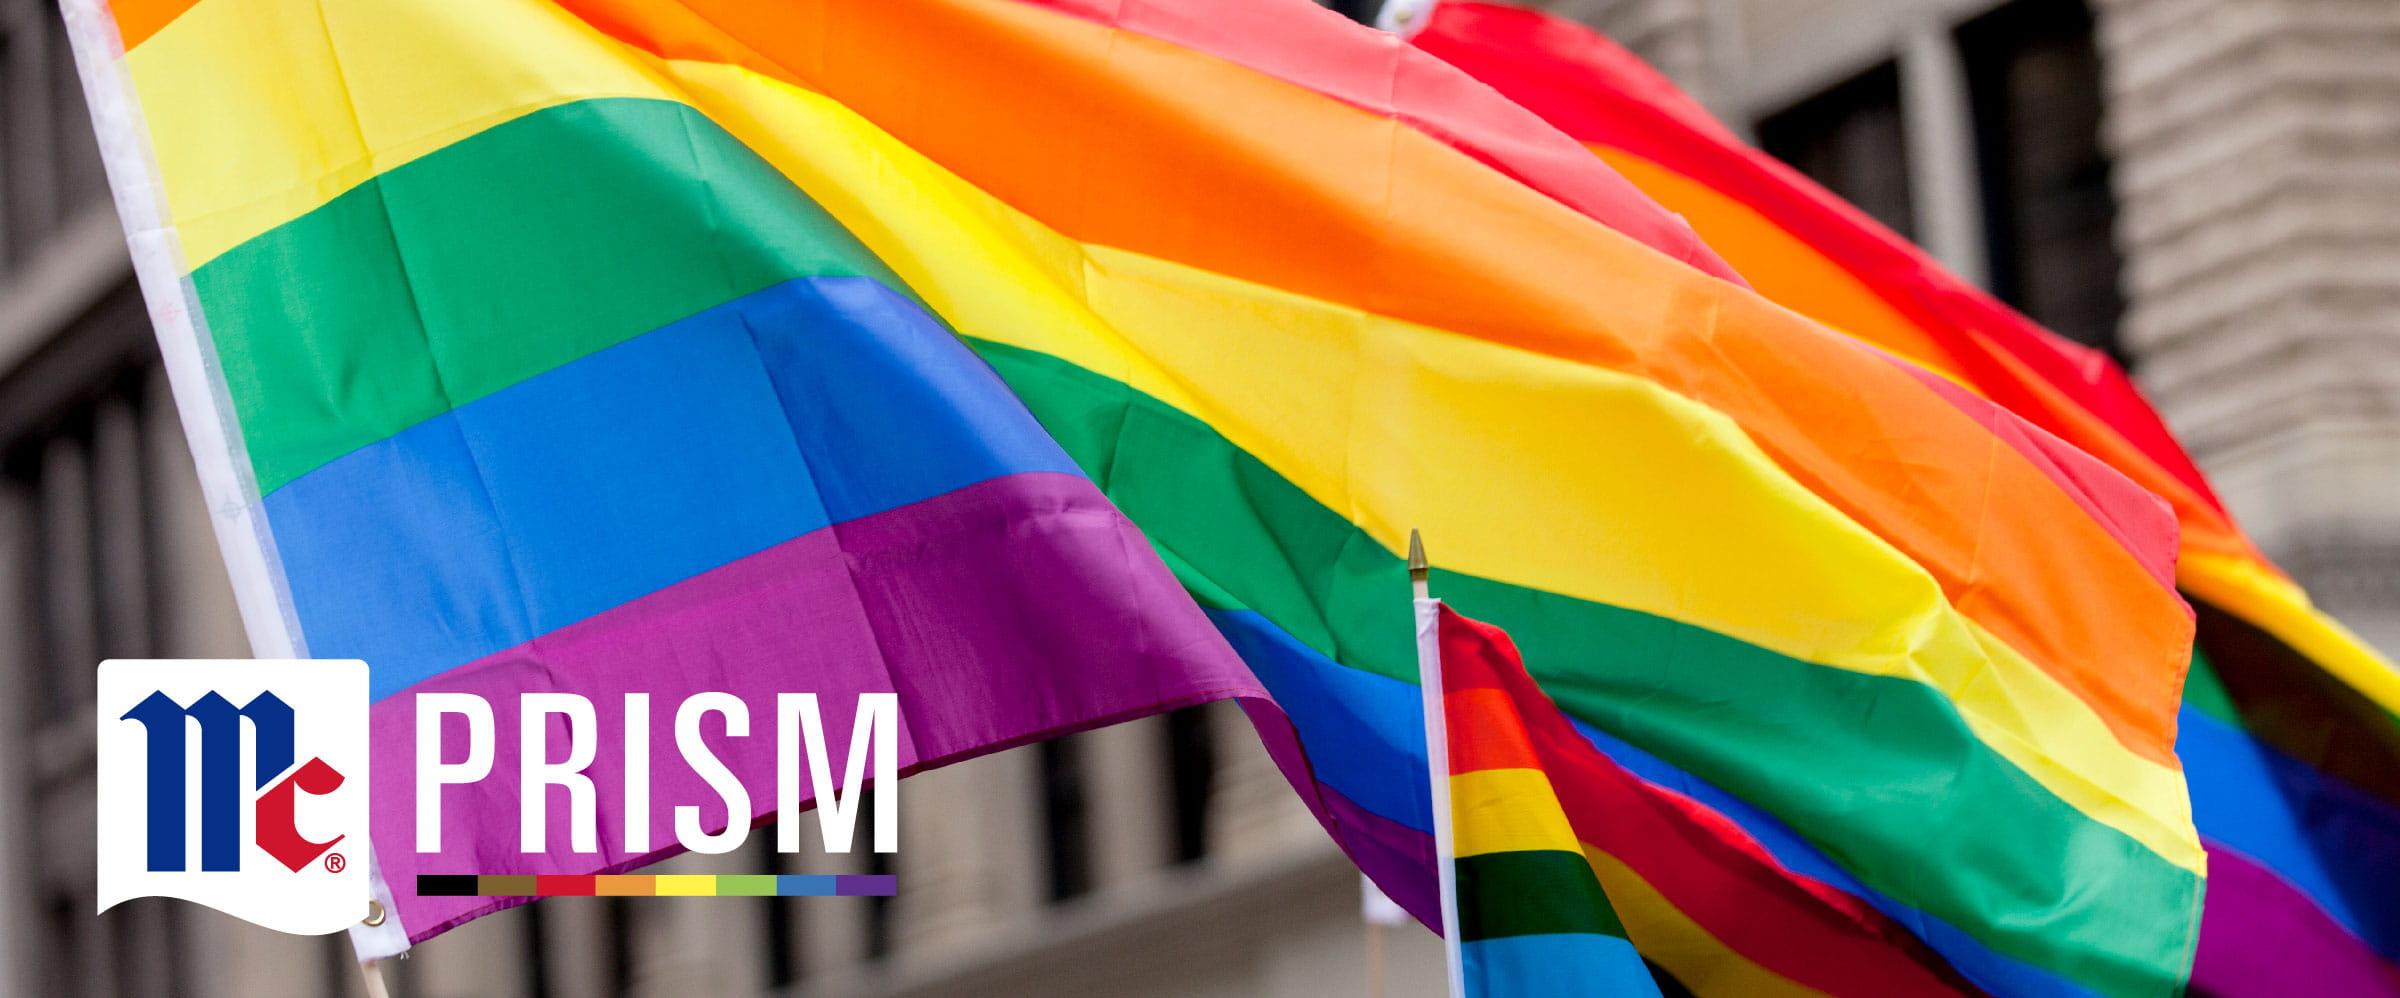 McCormick Pride Month; LGBTQ+ employee ambassador group